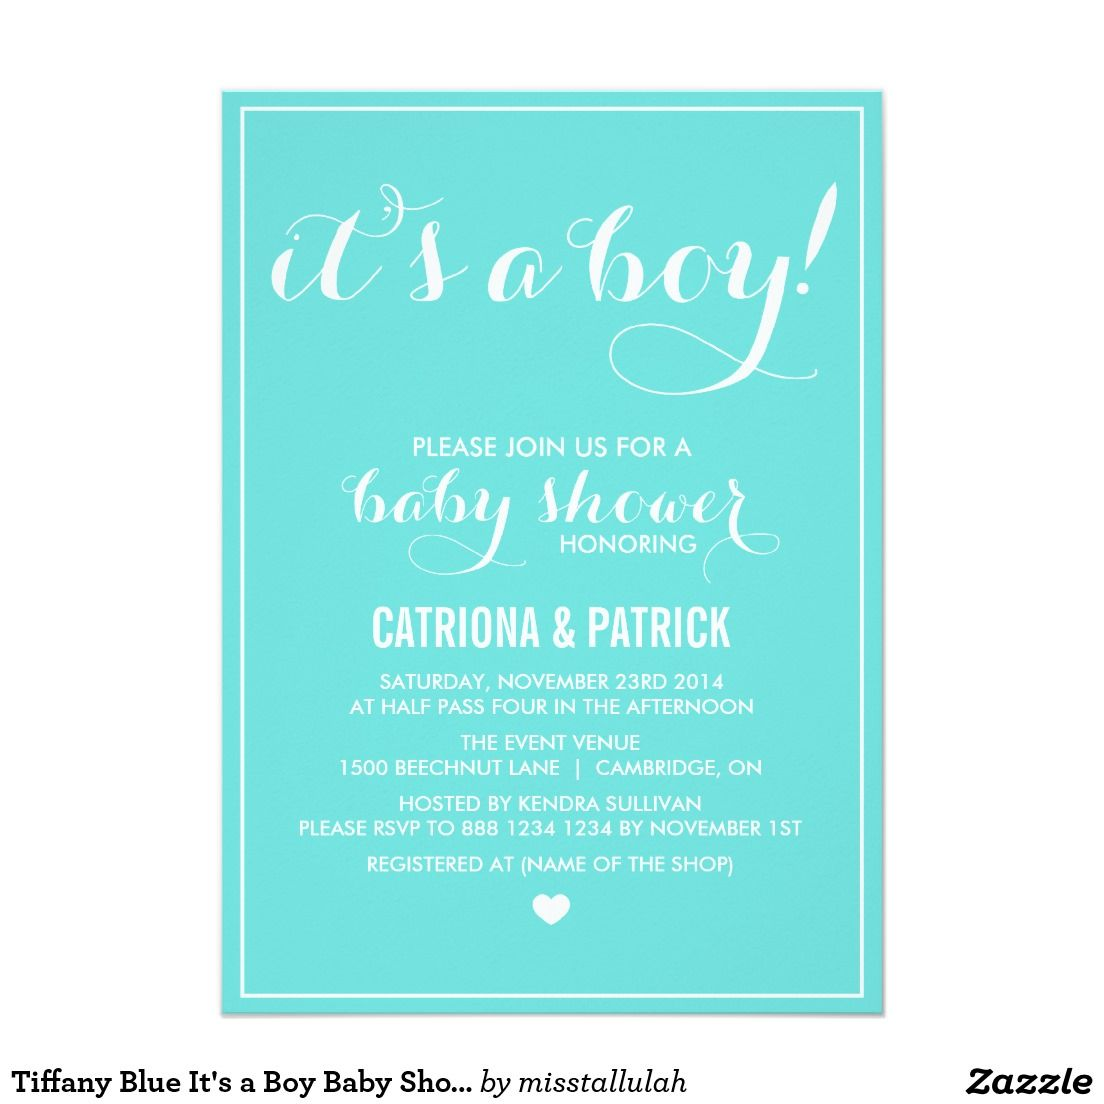 Tiffany Blue It\'s a Boy Baby Shower Invitation | Boy baby showers ...